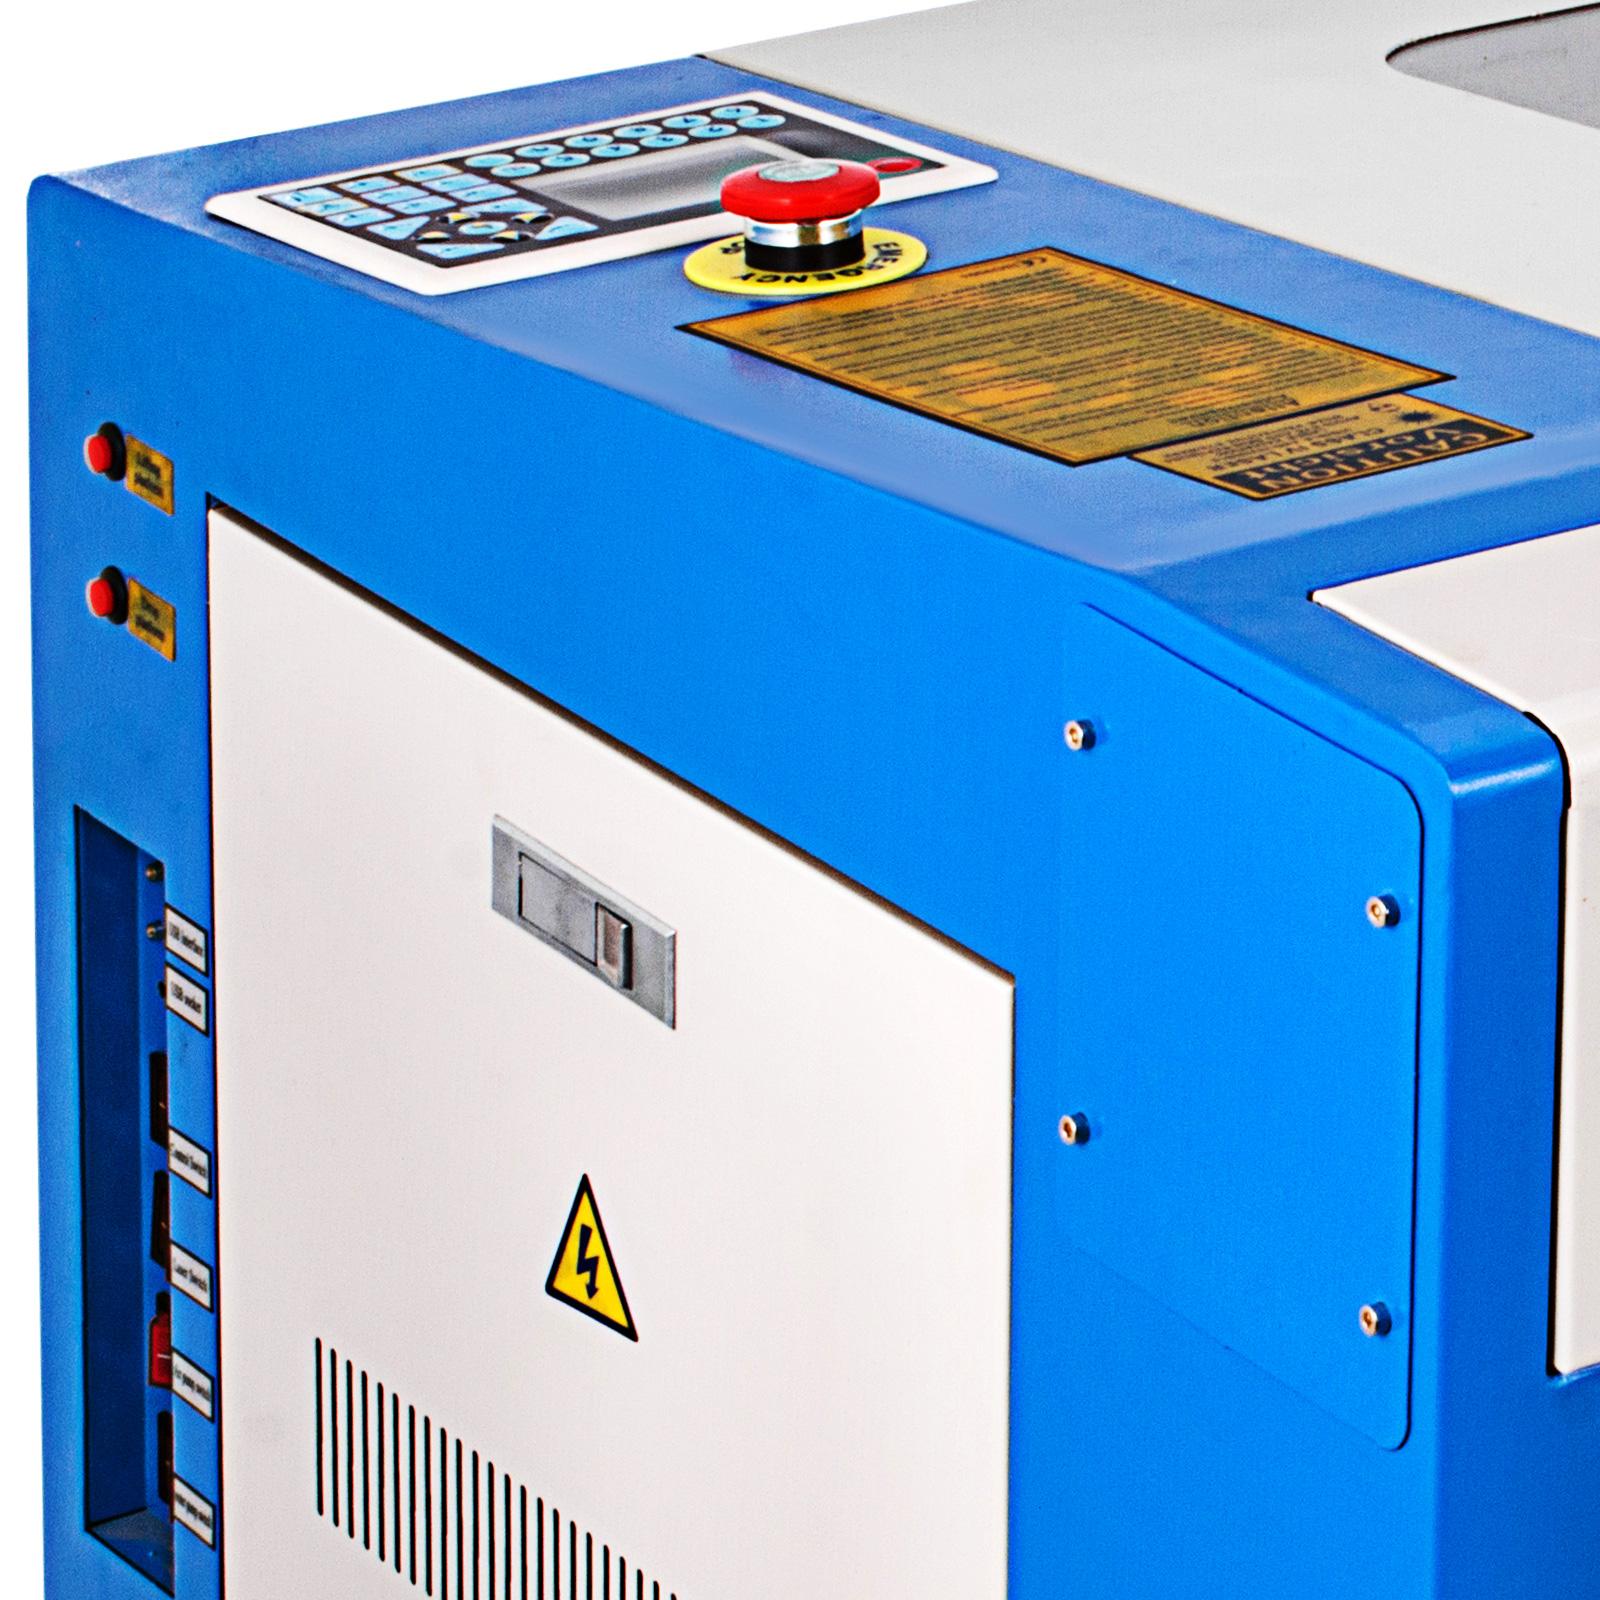 Macchina-per-Incisione-Laser-CO2-40-130W-Asse-Rotante-Tagliatrice-Incisore miniatura 36